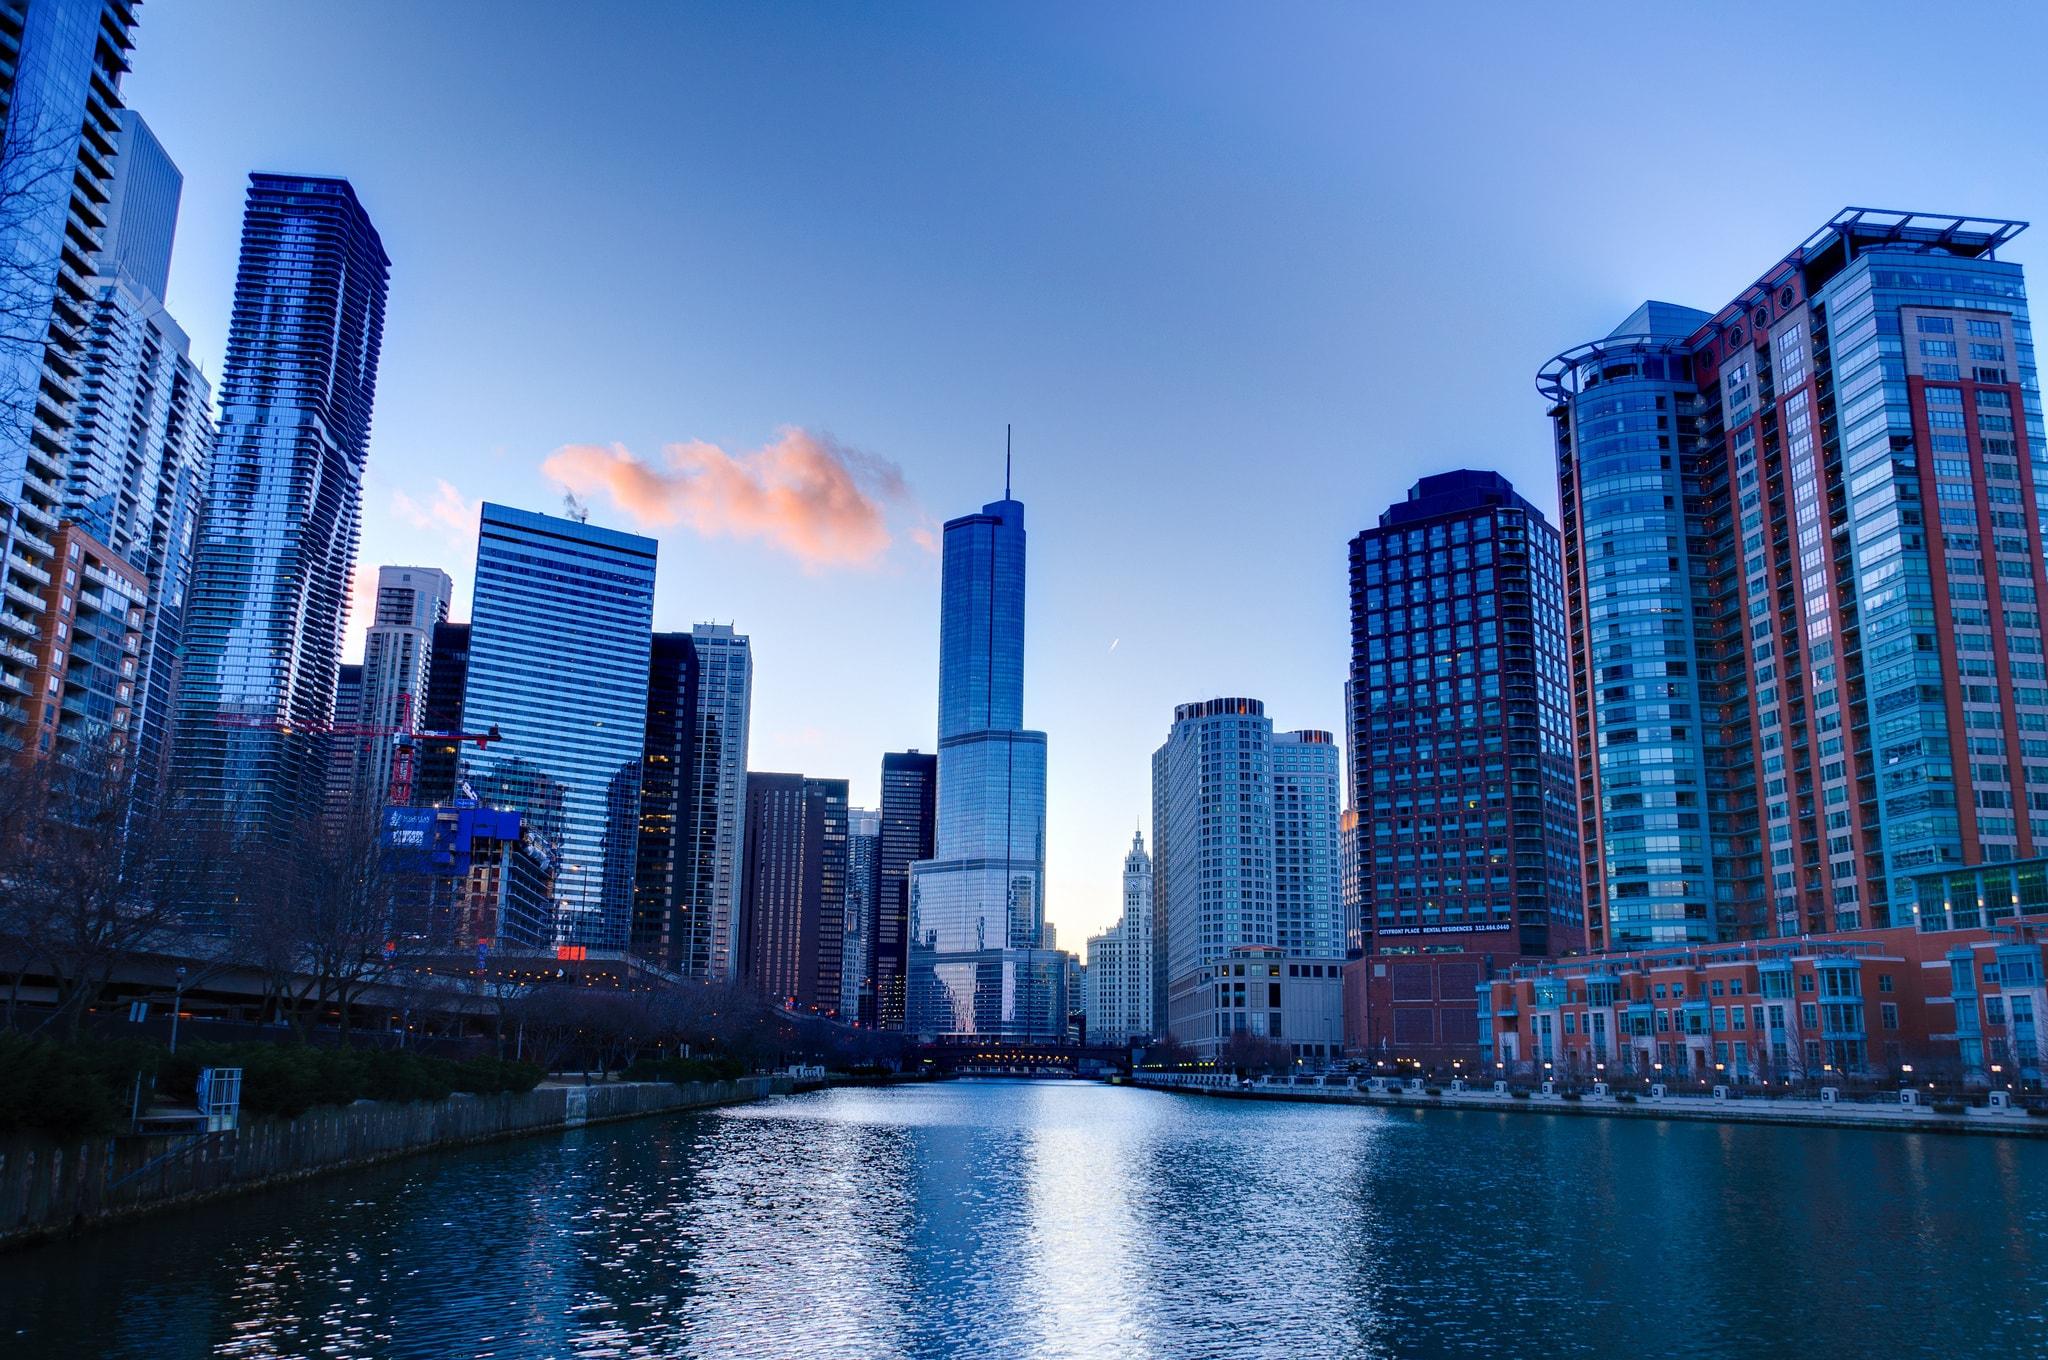 64 chicago hd wallpaper on wallpapersafari - Chicago skyline wallpaper 1920x1080 ...